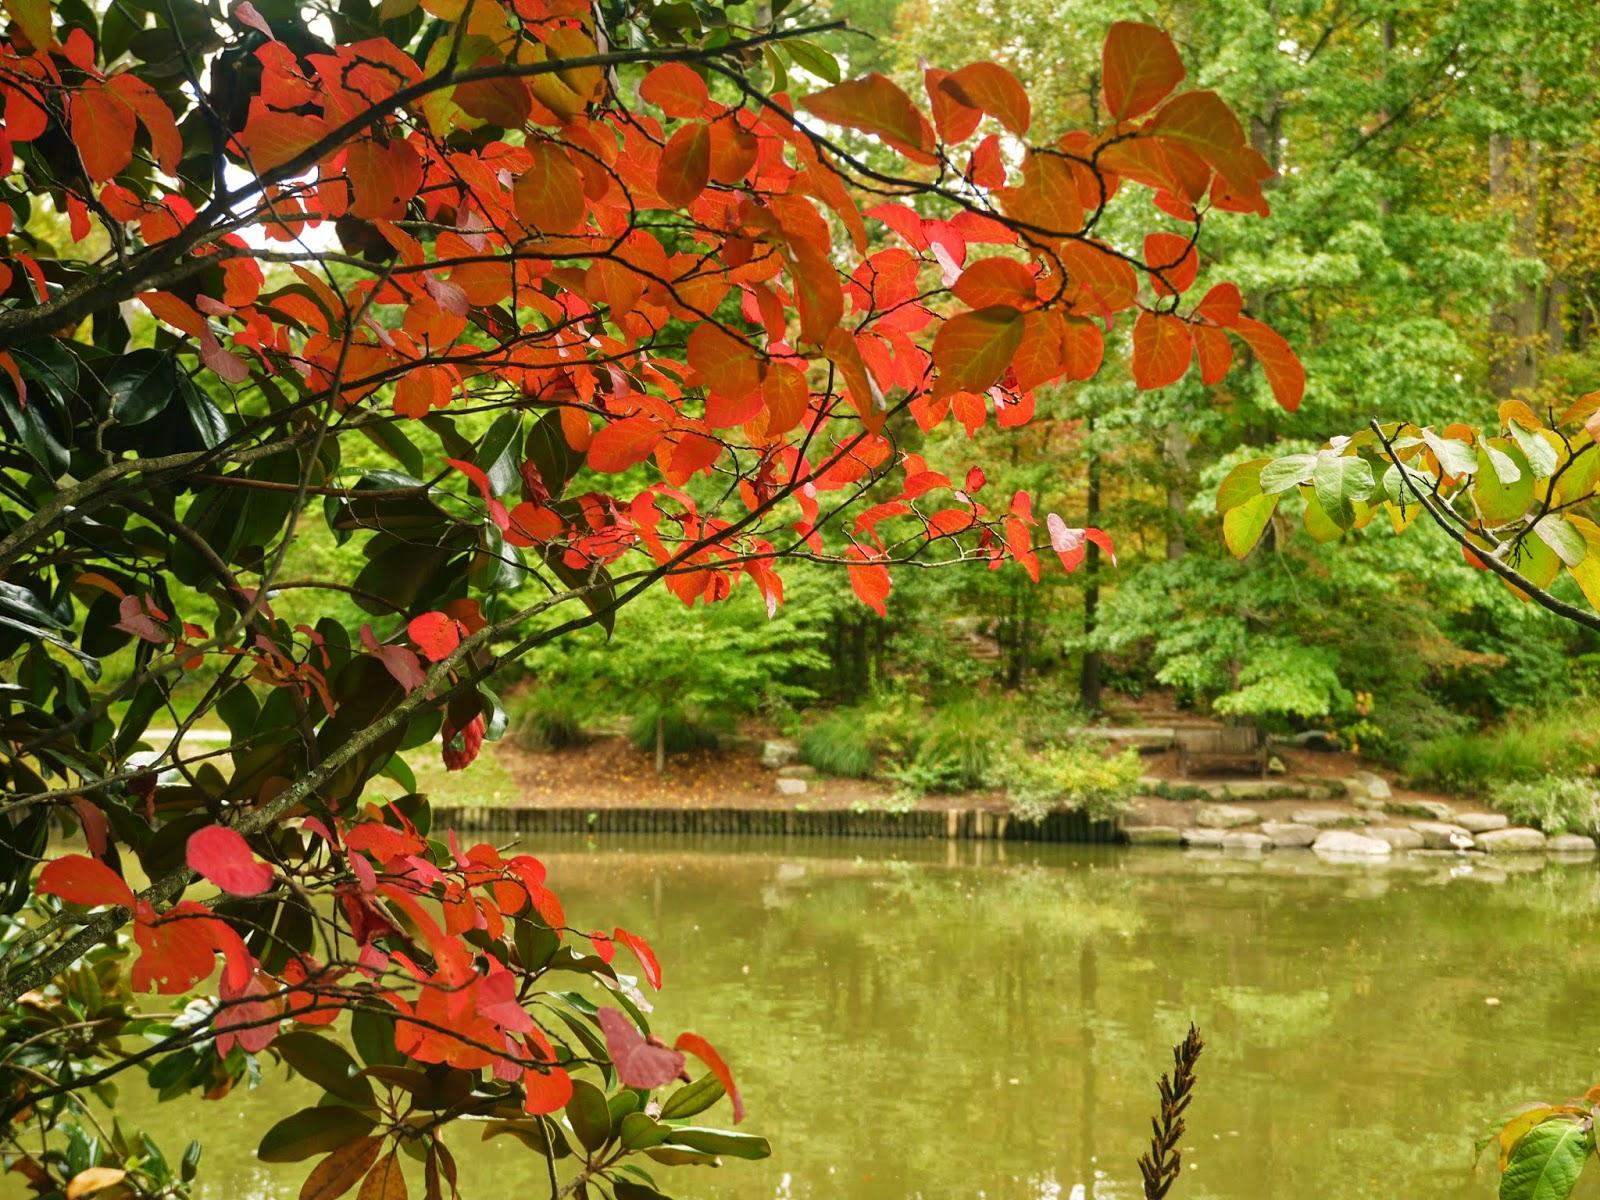 Gardens duke fall foliage and flowers - Gardening in fall ...